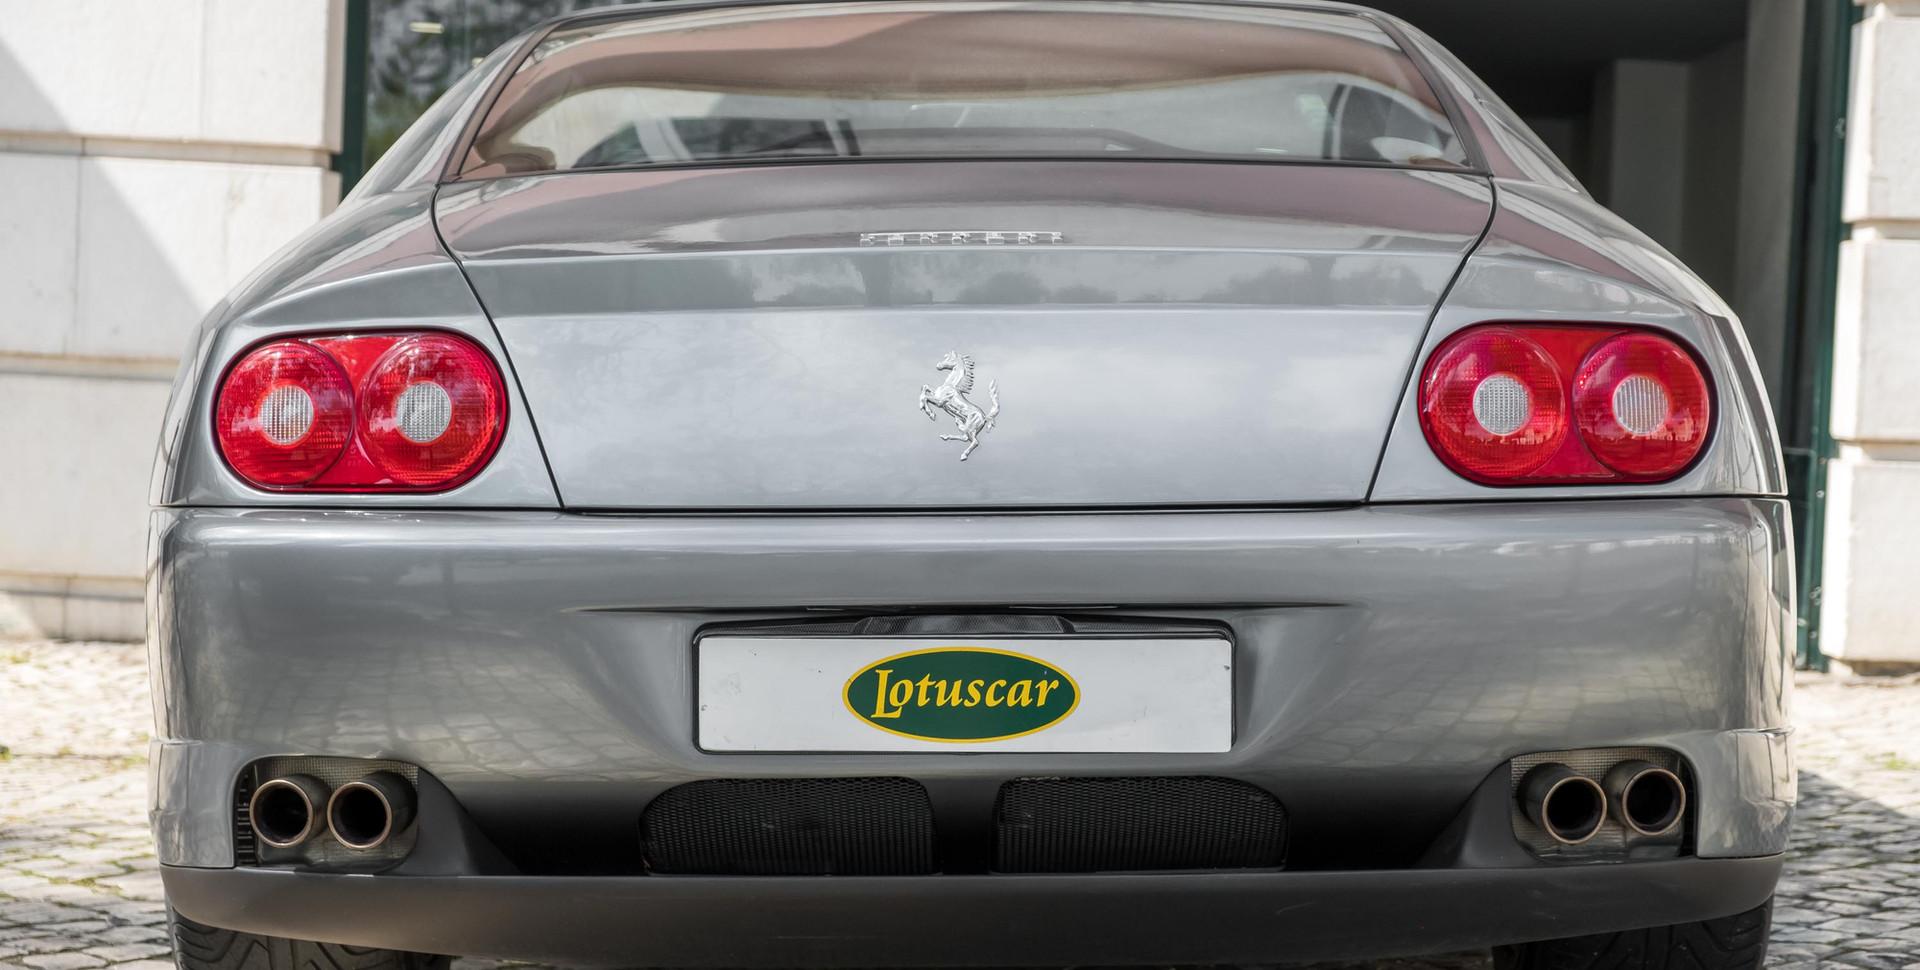 Ferrari 575M_-22.jpg